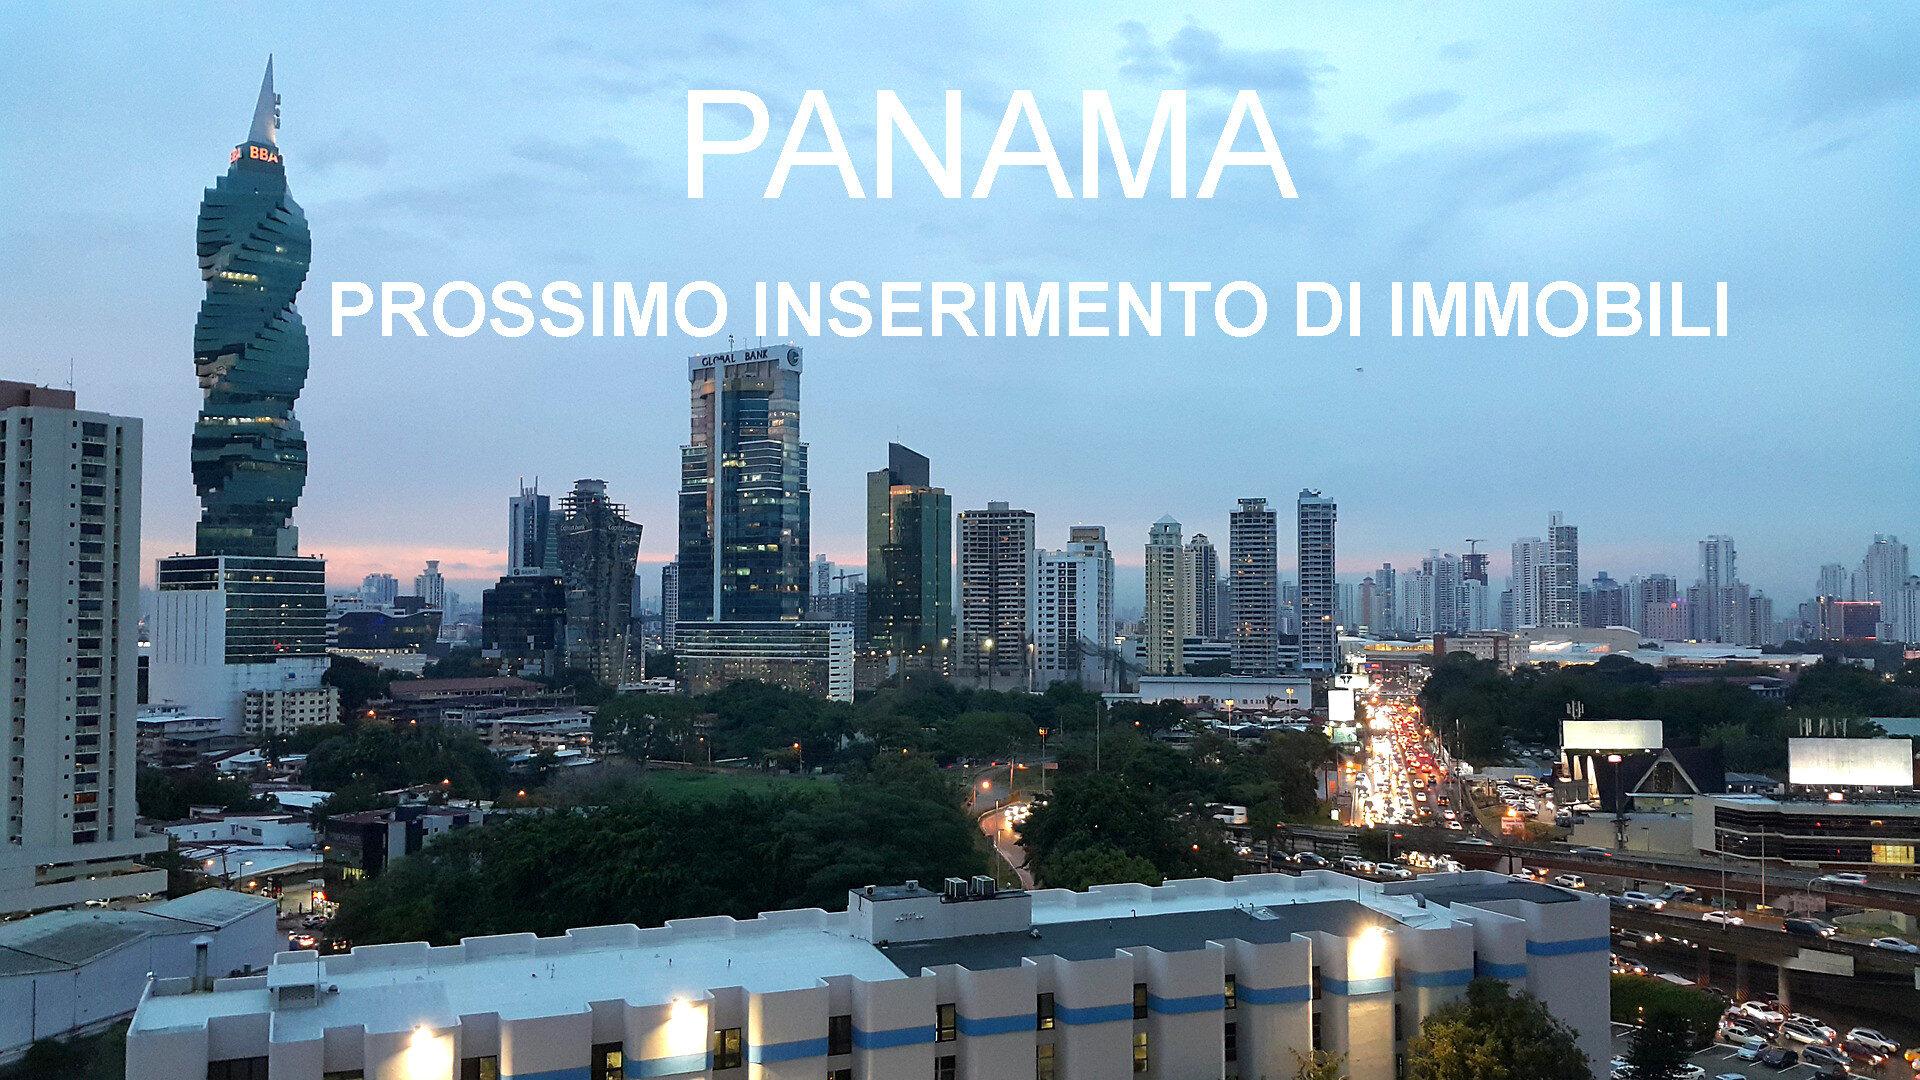 PANAMA – landscape-2095783_1920 COPIA